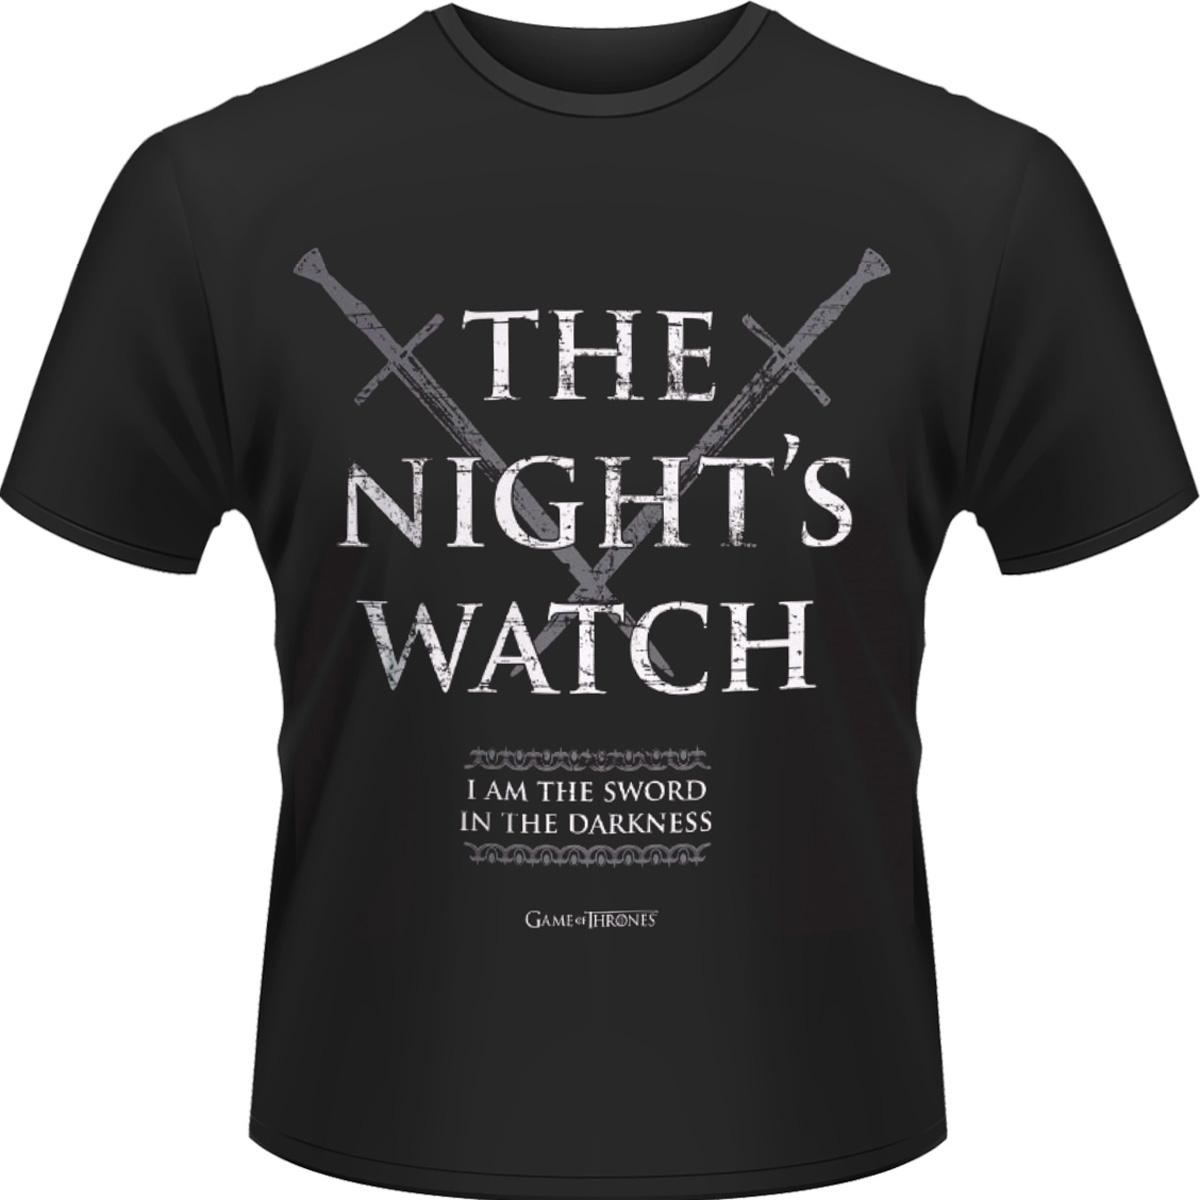 Night Watch - T-shirt =game of Thrones= - Merchandise - PHDM - 0803341452527 - 6/10-2014